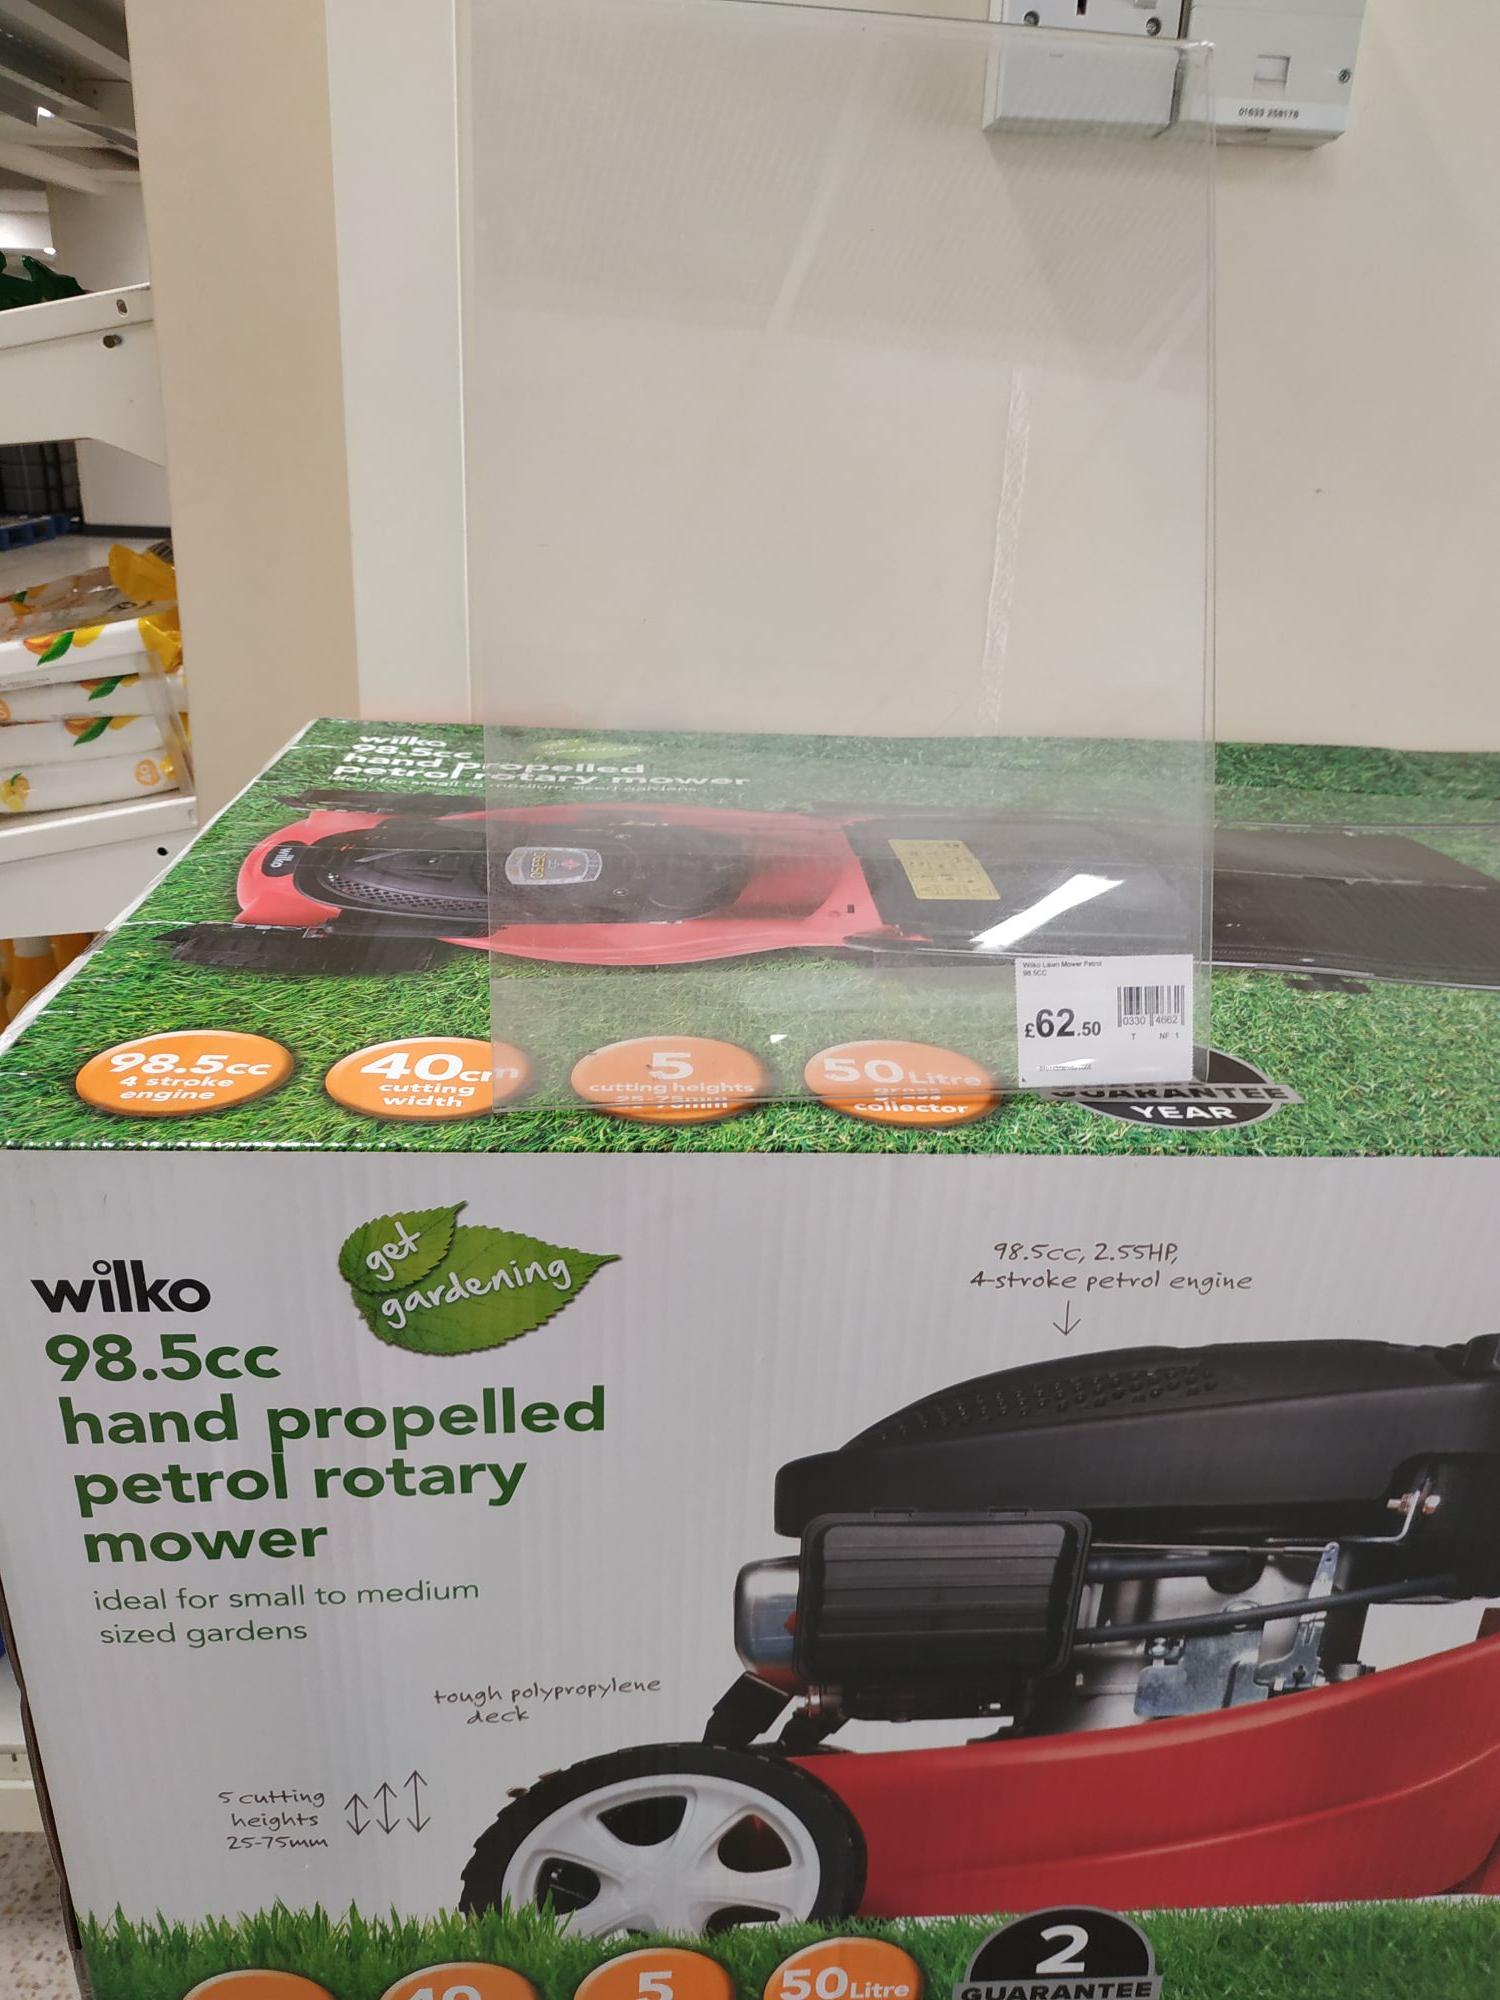 98.5cc Petrol Lawn Mower £62.50 @ Wilko in-store